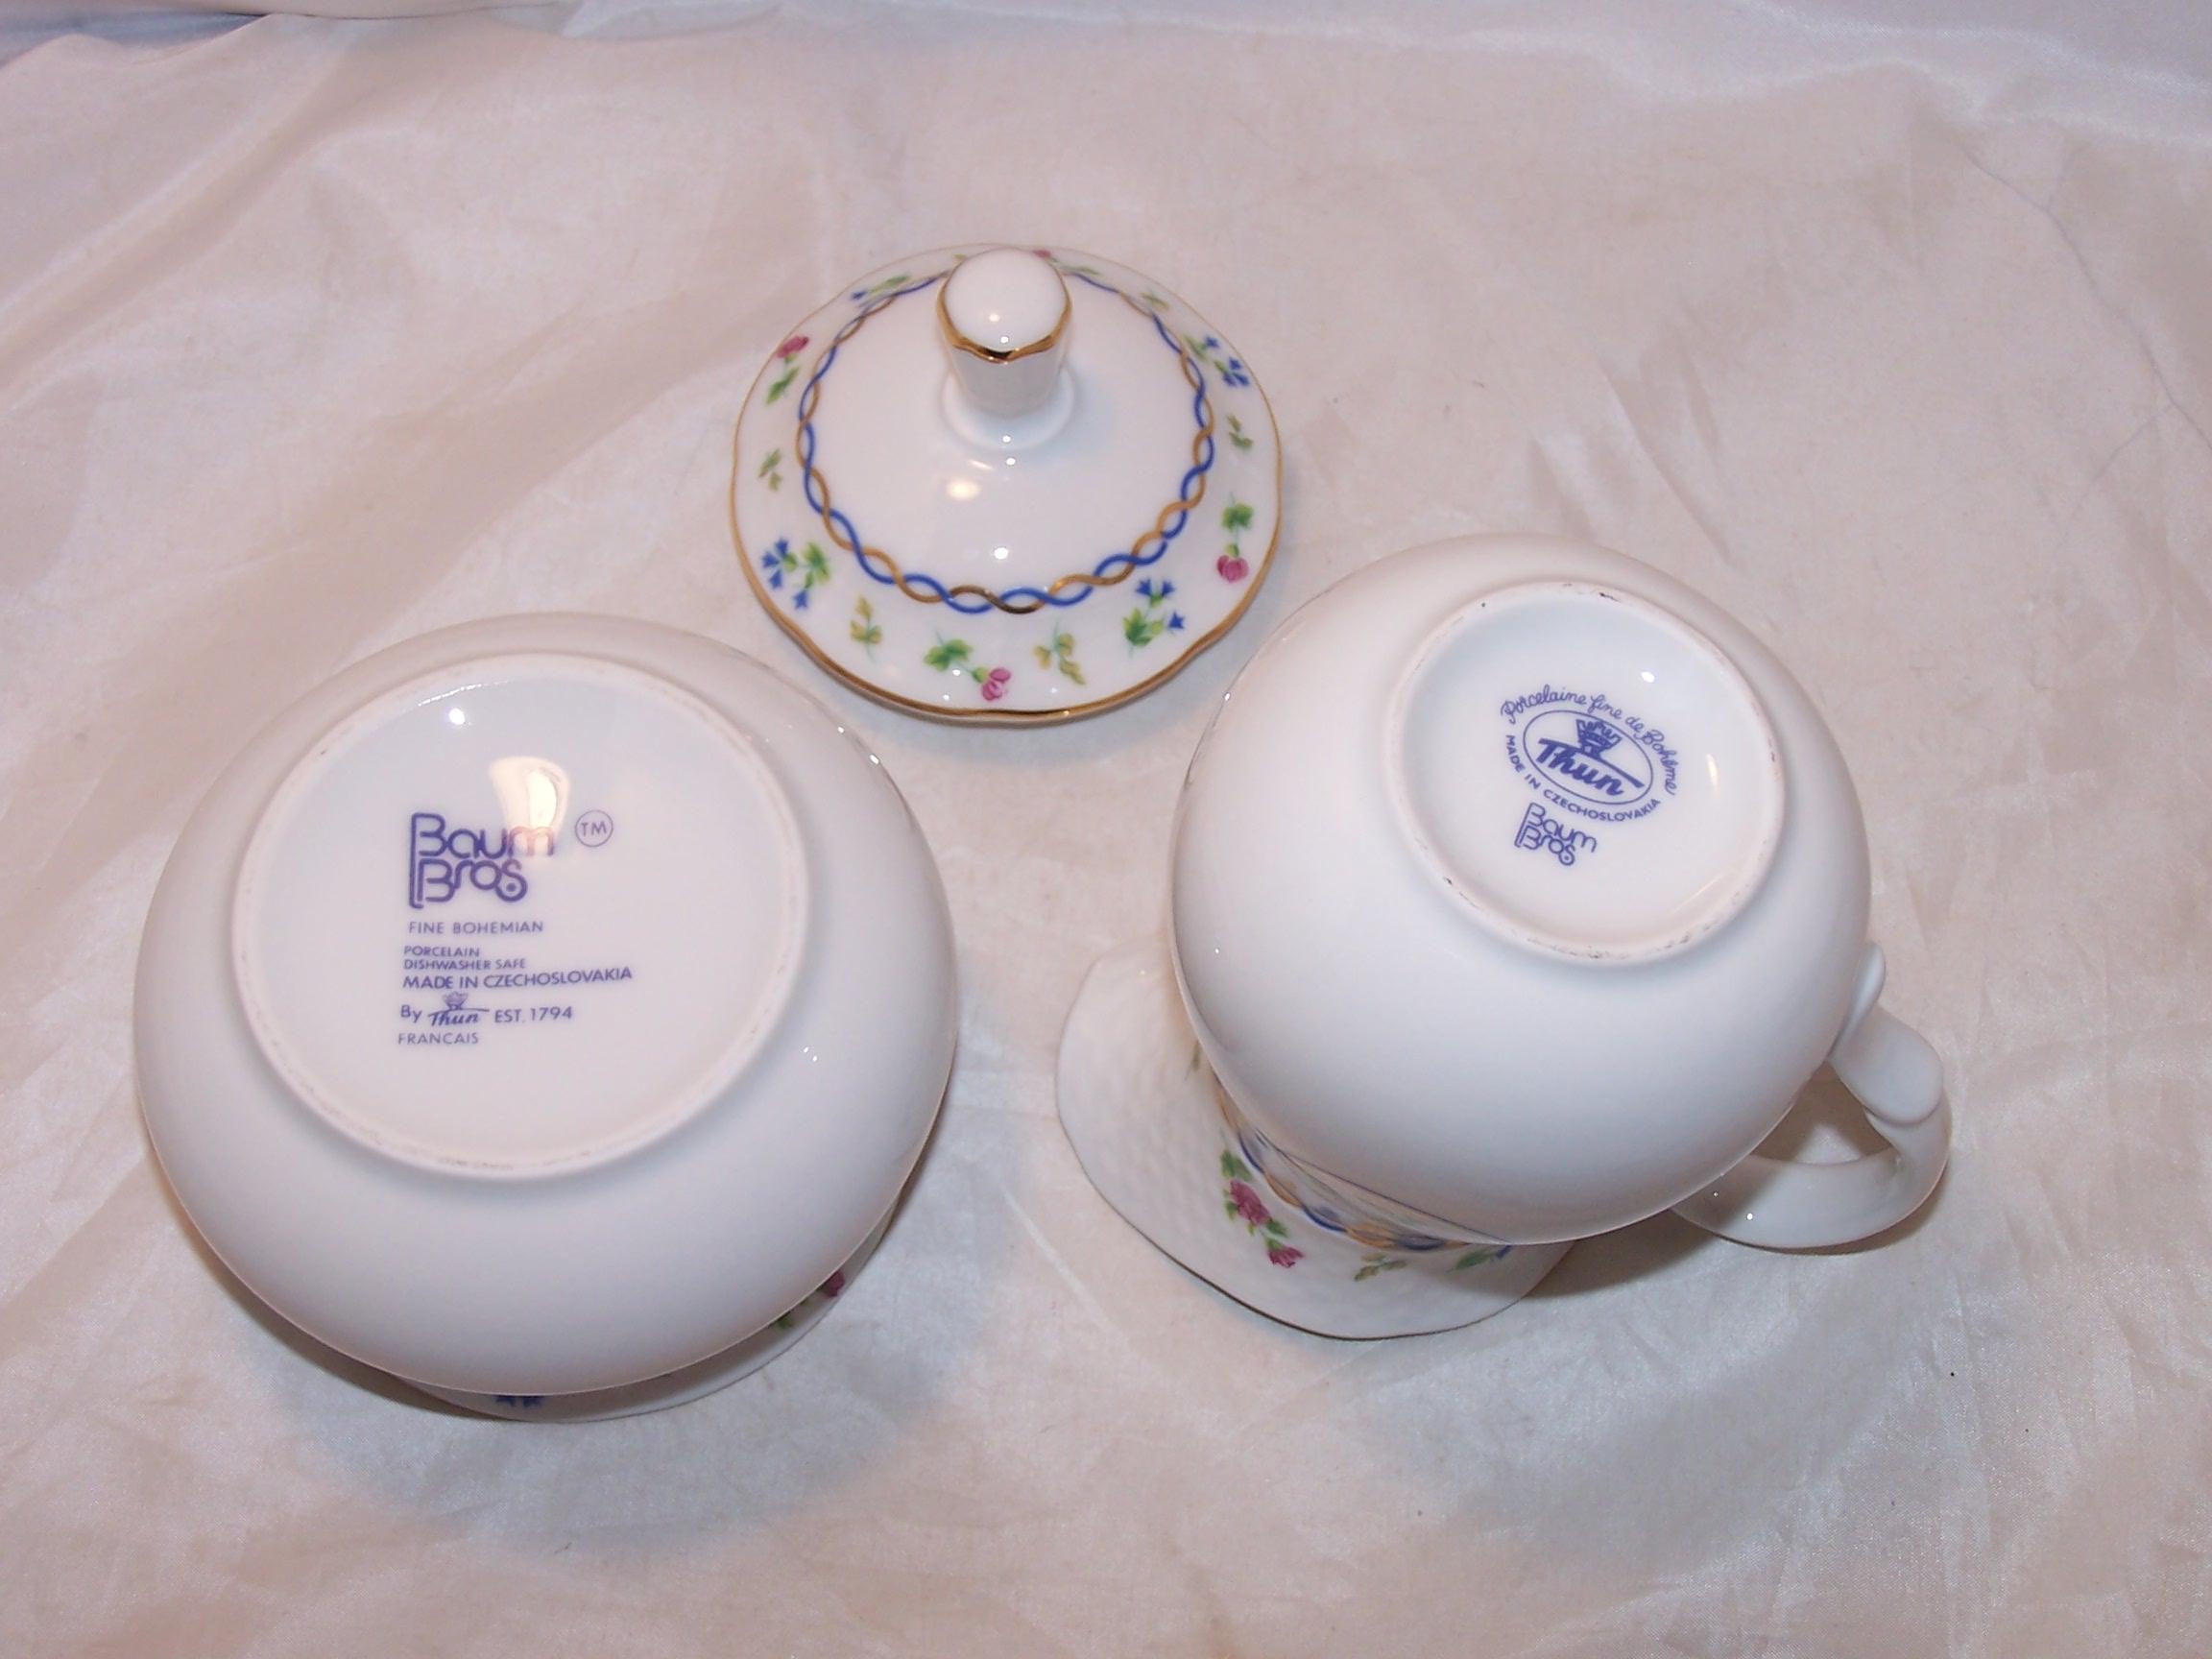 Image 5 of Baum Bros Thun Porcelain Creamer and Sugar, Czechoslovakia